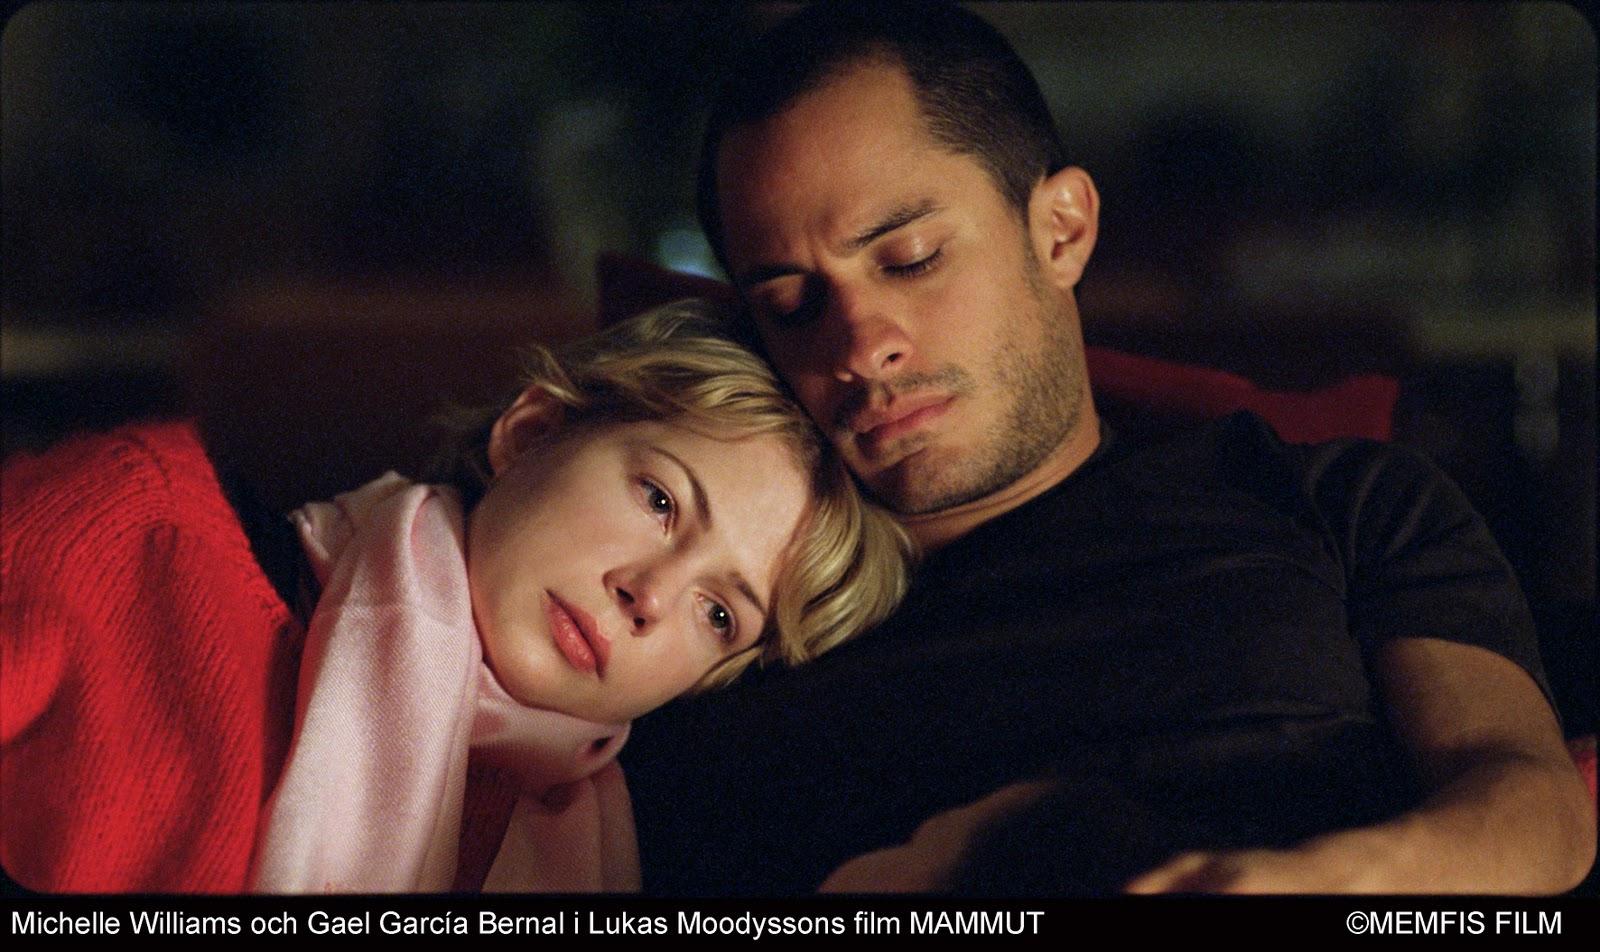 http://1.bp.blogspot.com/_tCnPvdnJd3k/TKCUw1mg87I/AAAAAAAASPI/yx4UGVCQRWQ/s1600/Gael+Garcia+Bernal+y+Michelle+Williams+dirigidos+por+Lukas+Moodysson+en+el+film+sueco+Mammoth.jpg